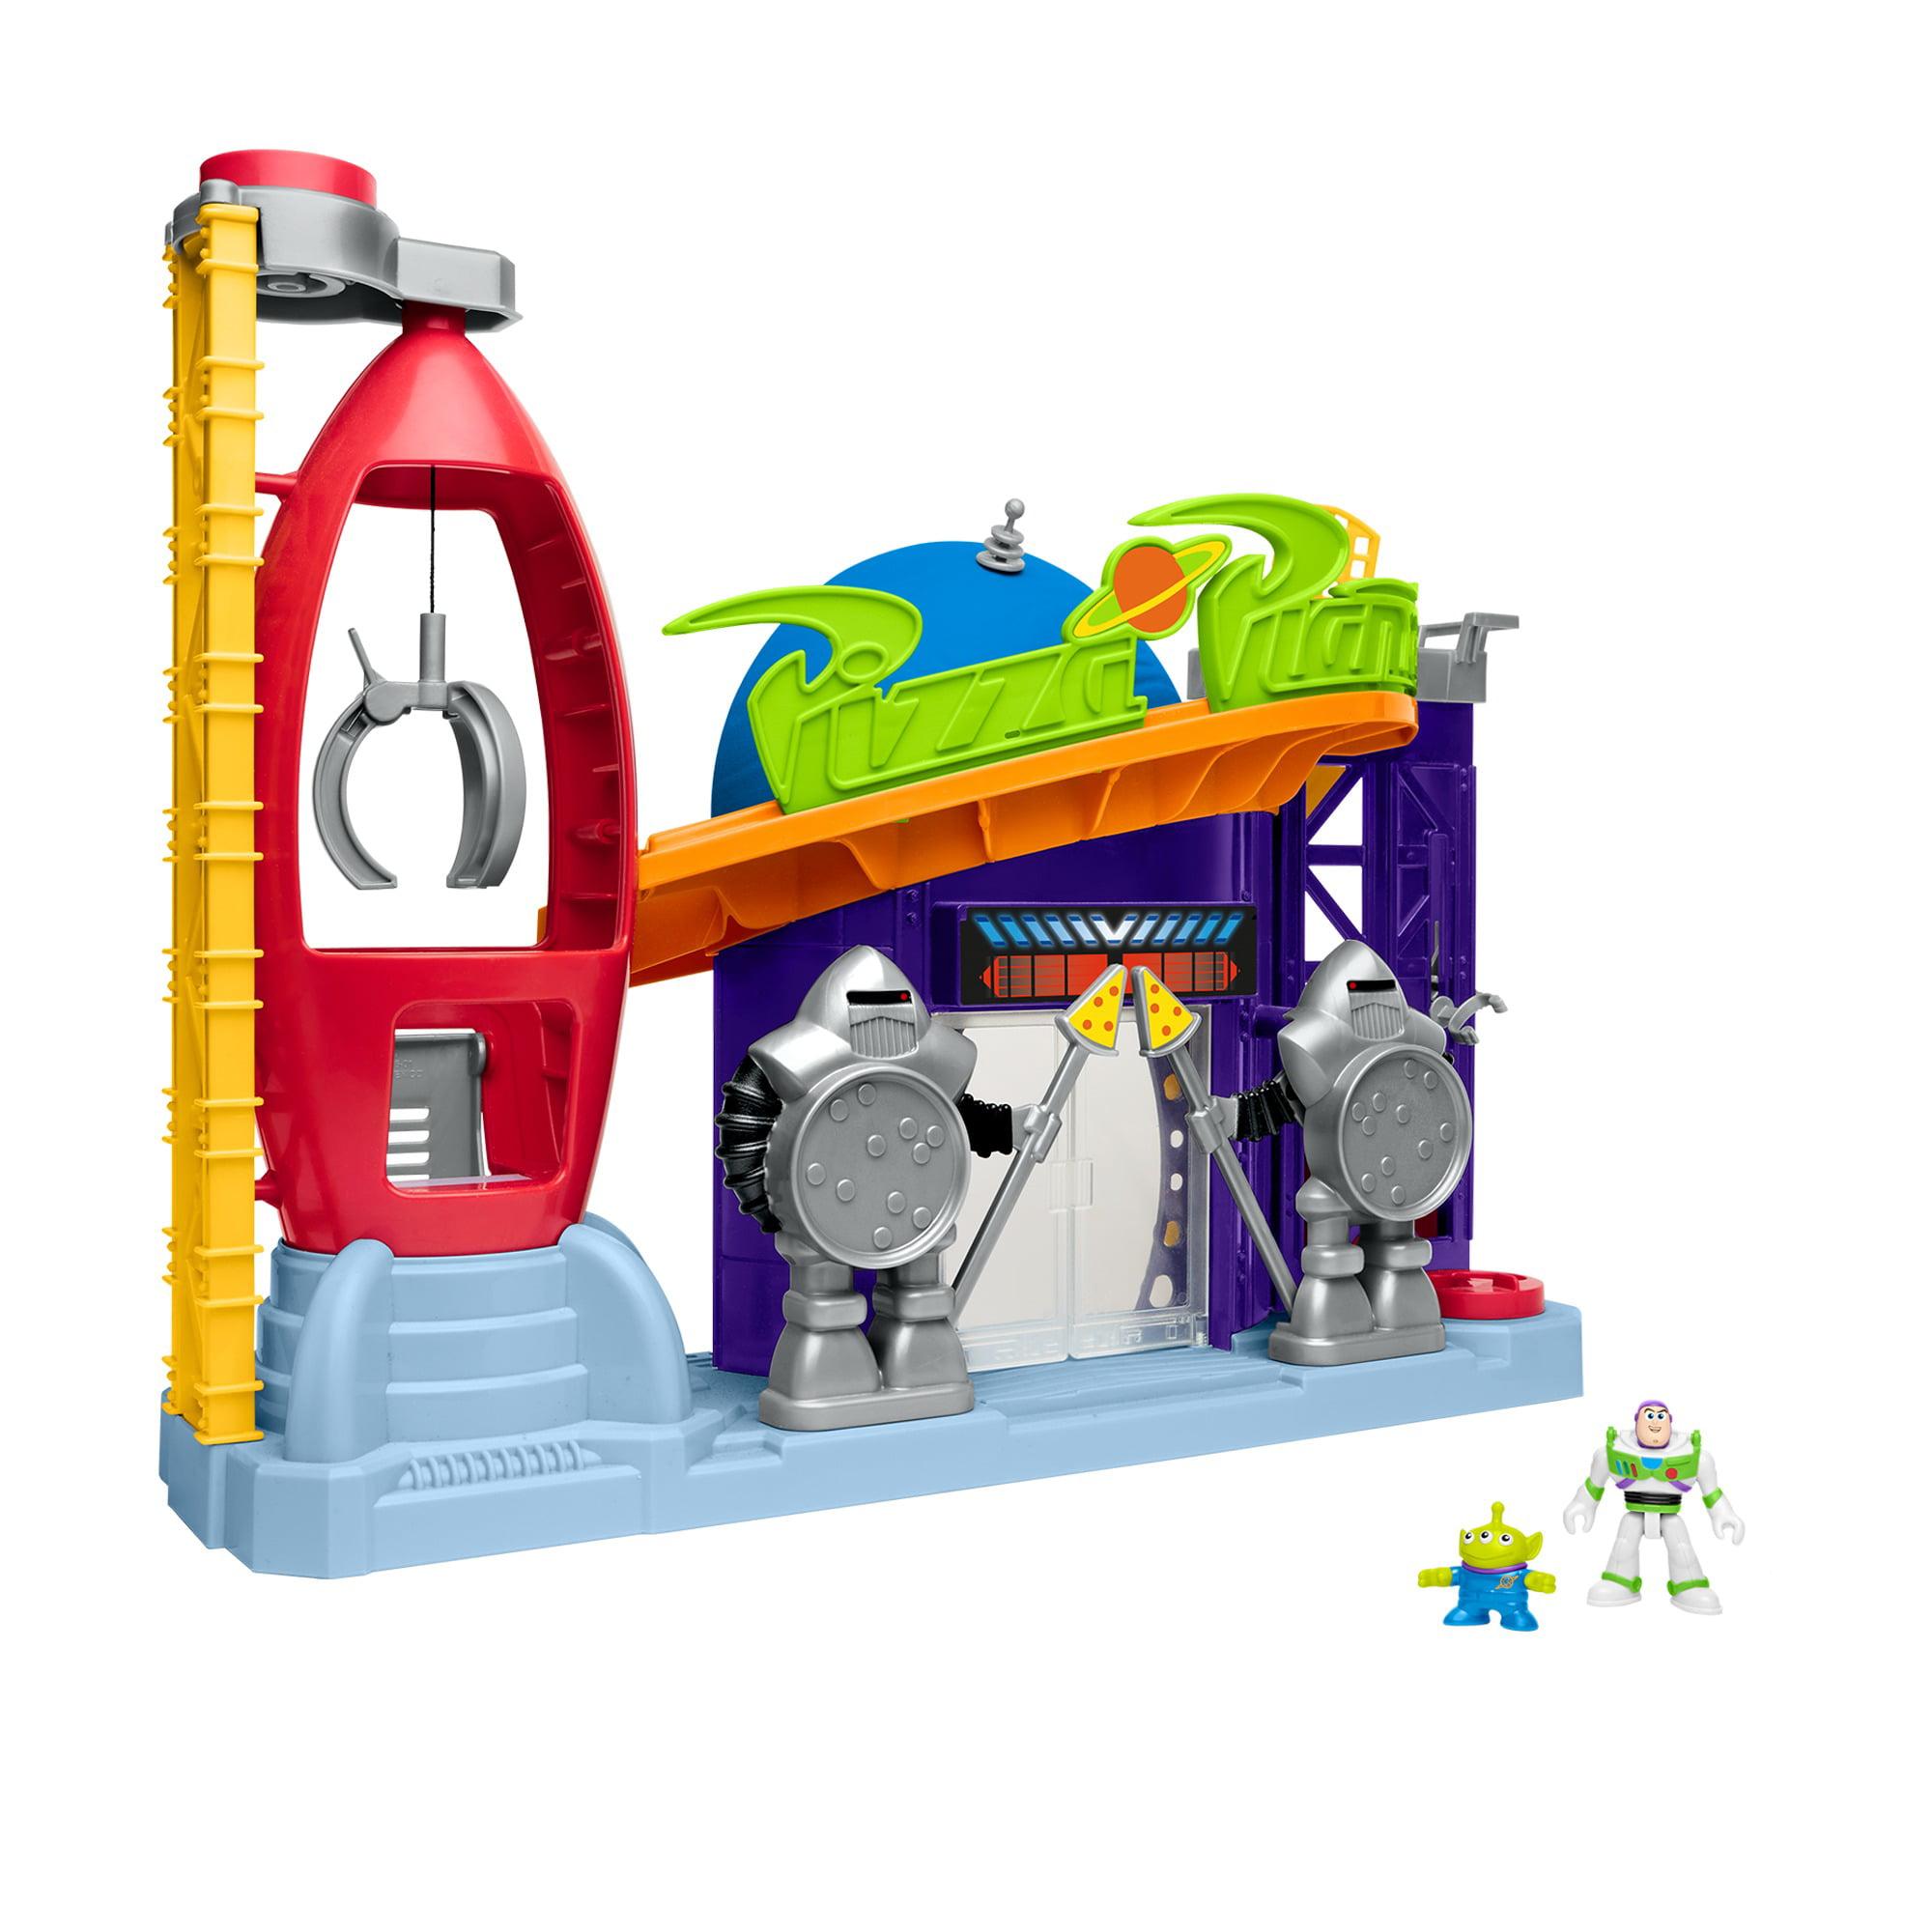 Imaginext Disney Pixar Toy Story Pizza Planet Playset Walmart Com Walmart Com